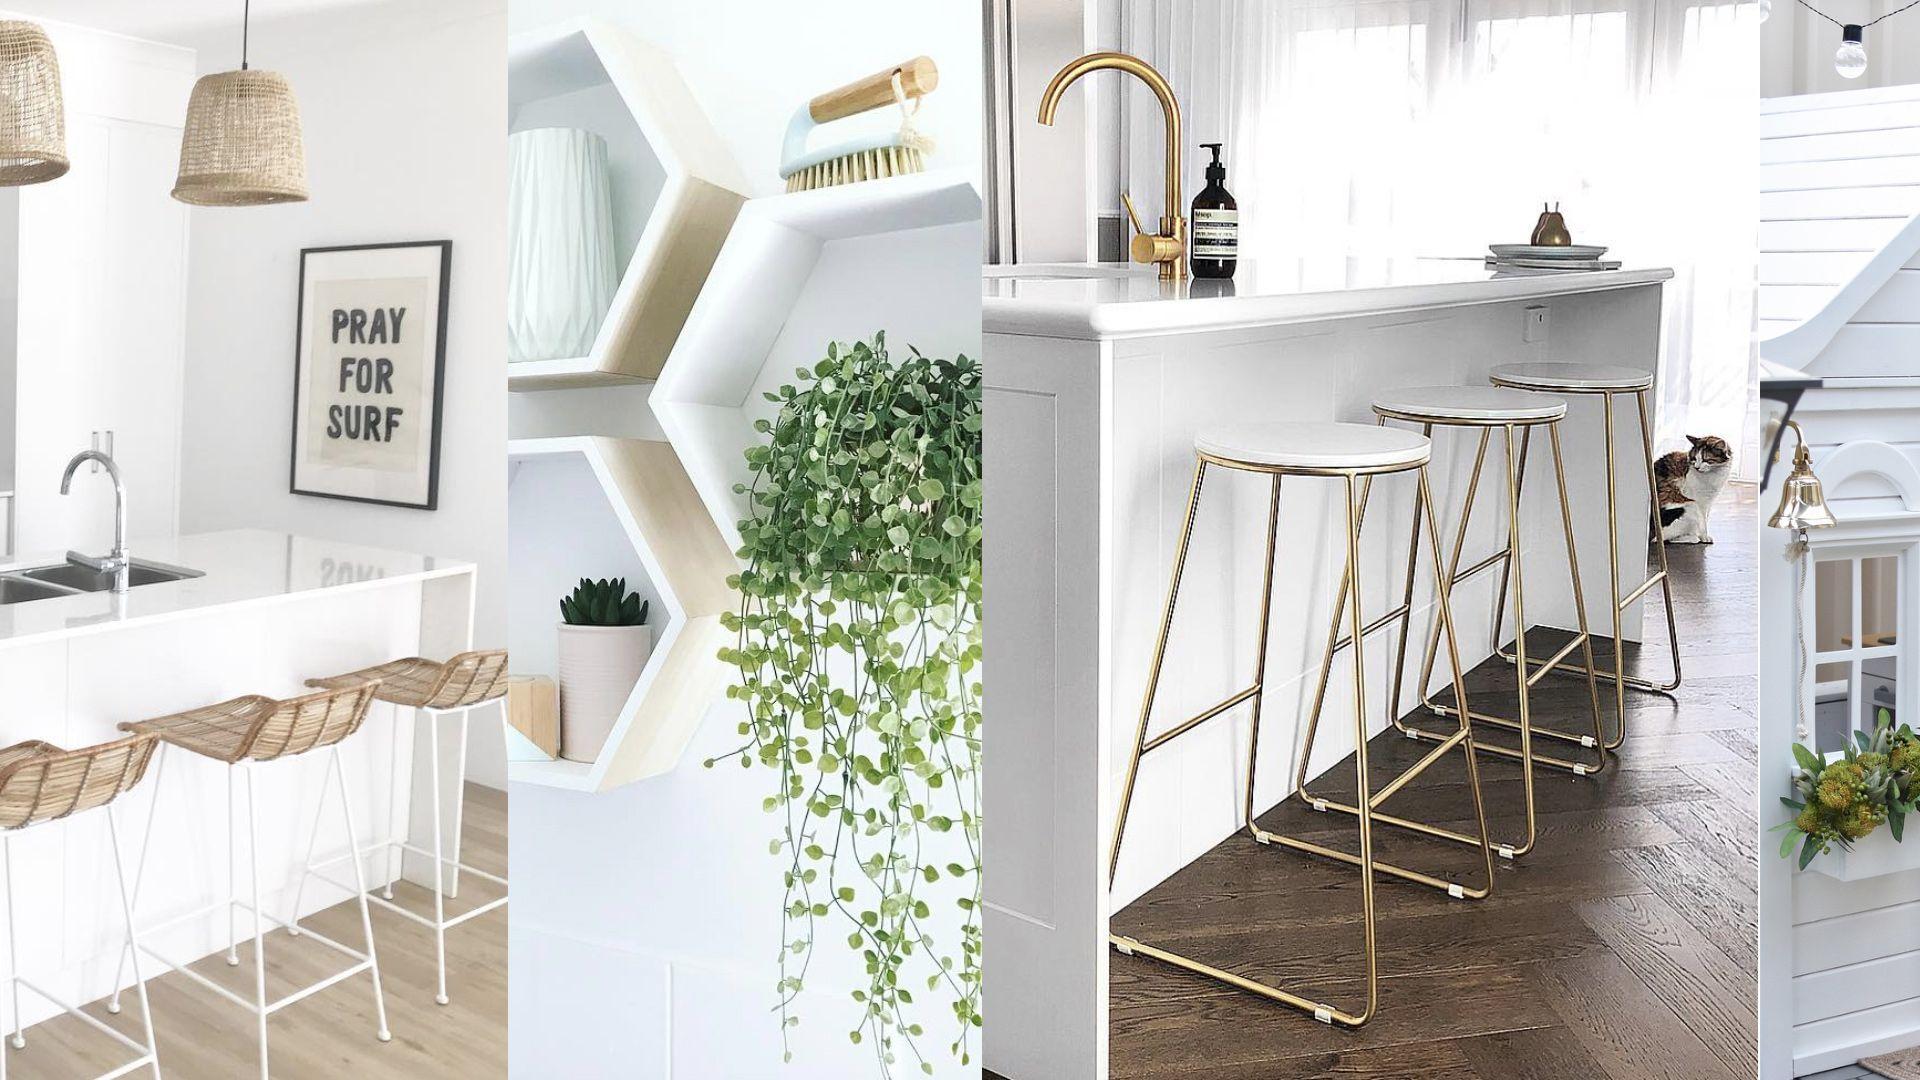 50 best ever kmart hacks on the internet with images white modern kitchen home decor hacks on kitchen ideas kmart id=82566